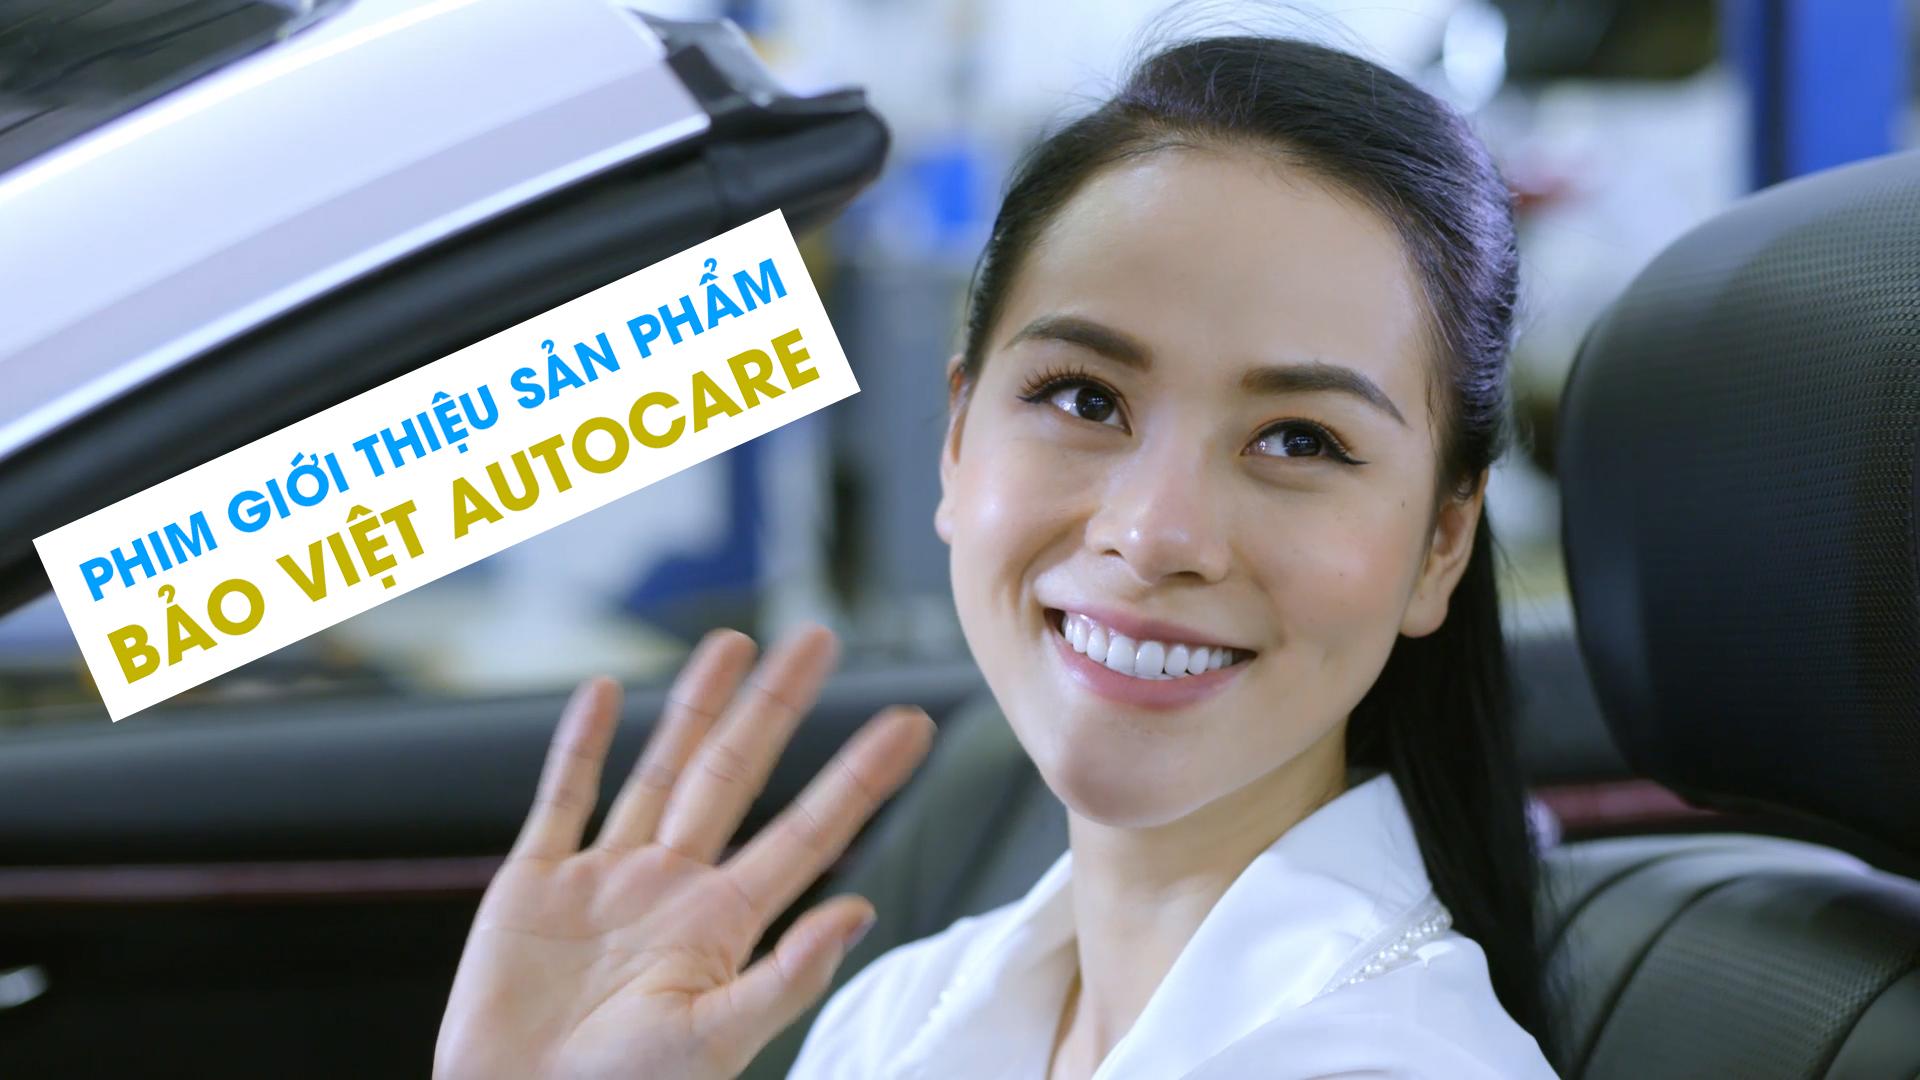 Phim giới thiệu sản phẩm Bảo Việt AutoCare